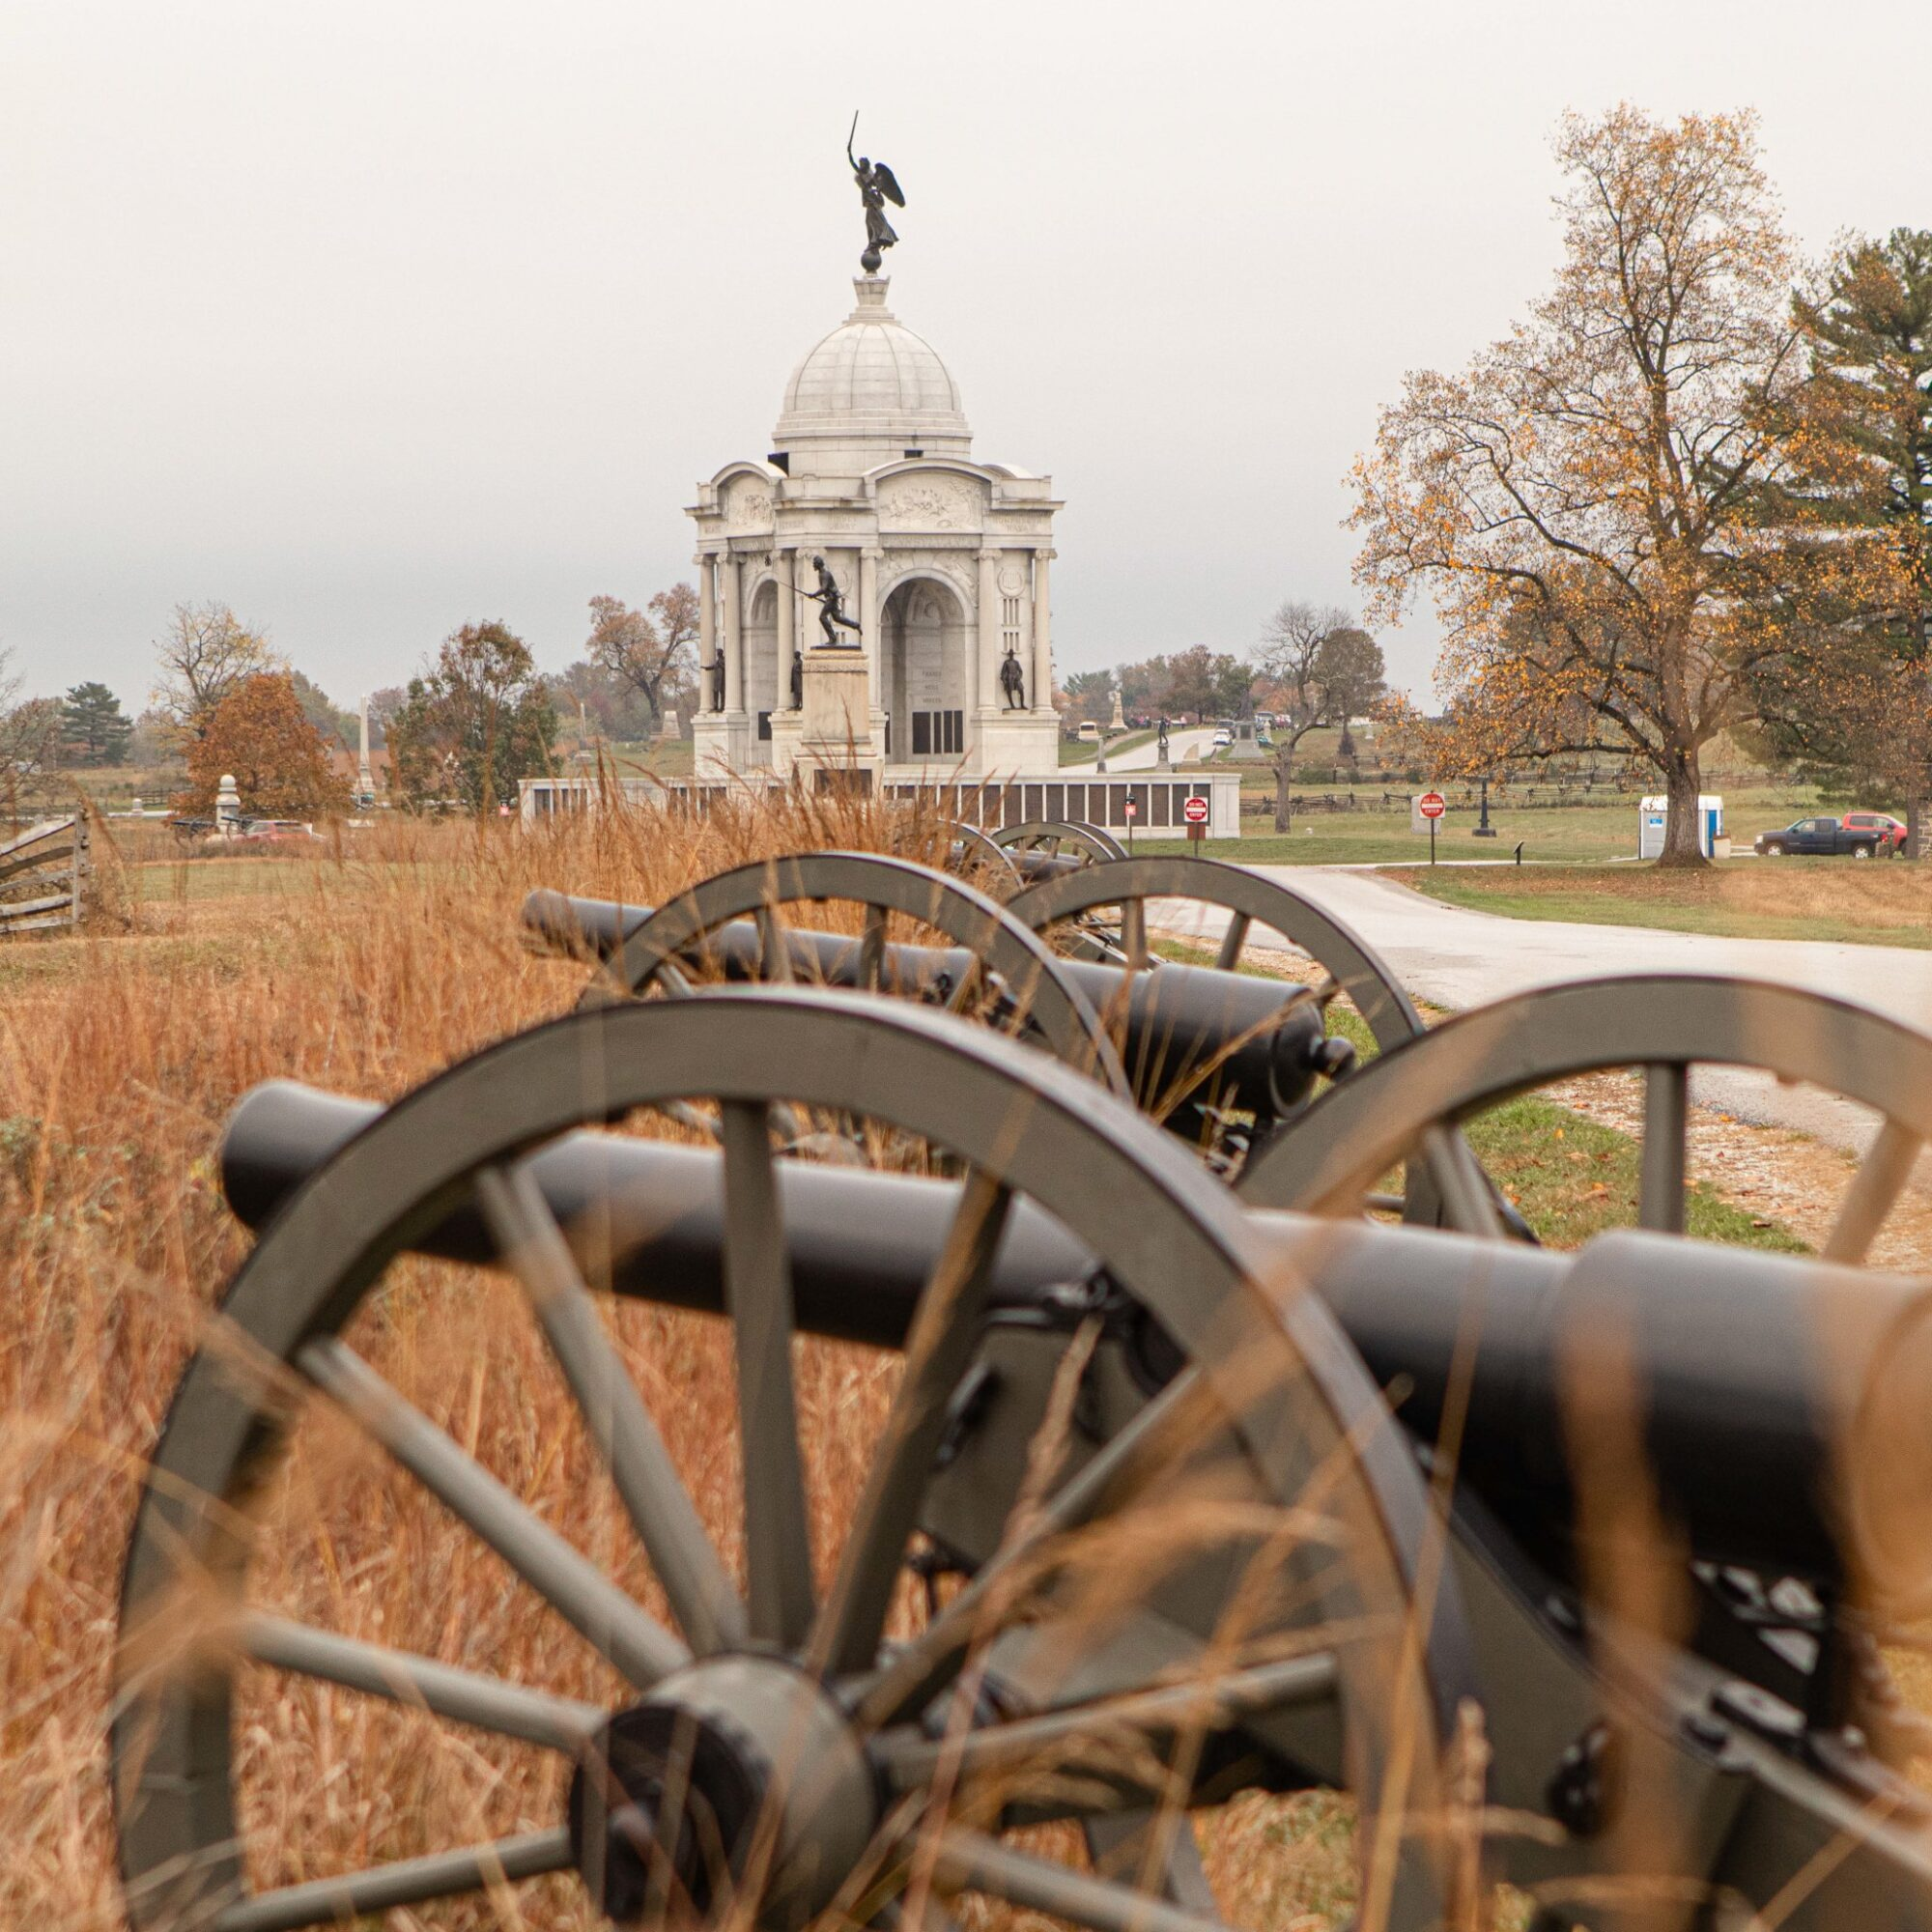 The historic Gettysburg Battlefield in Pennsylvania.